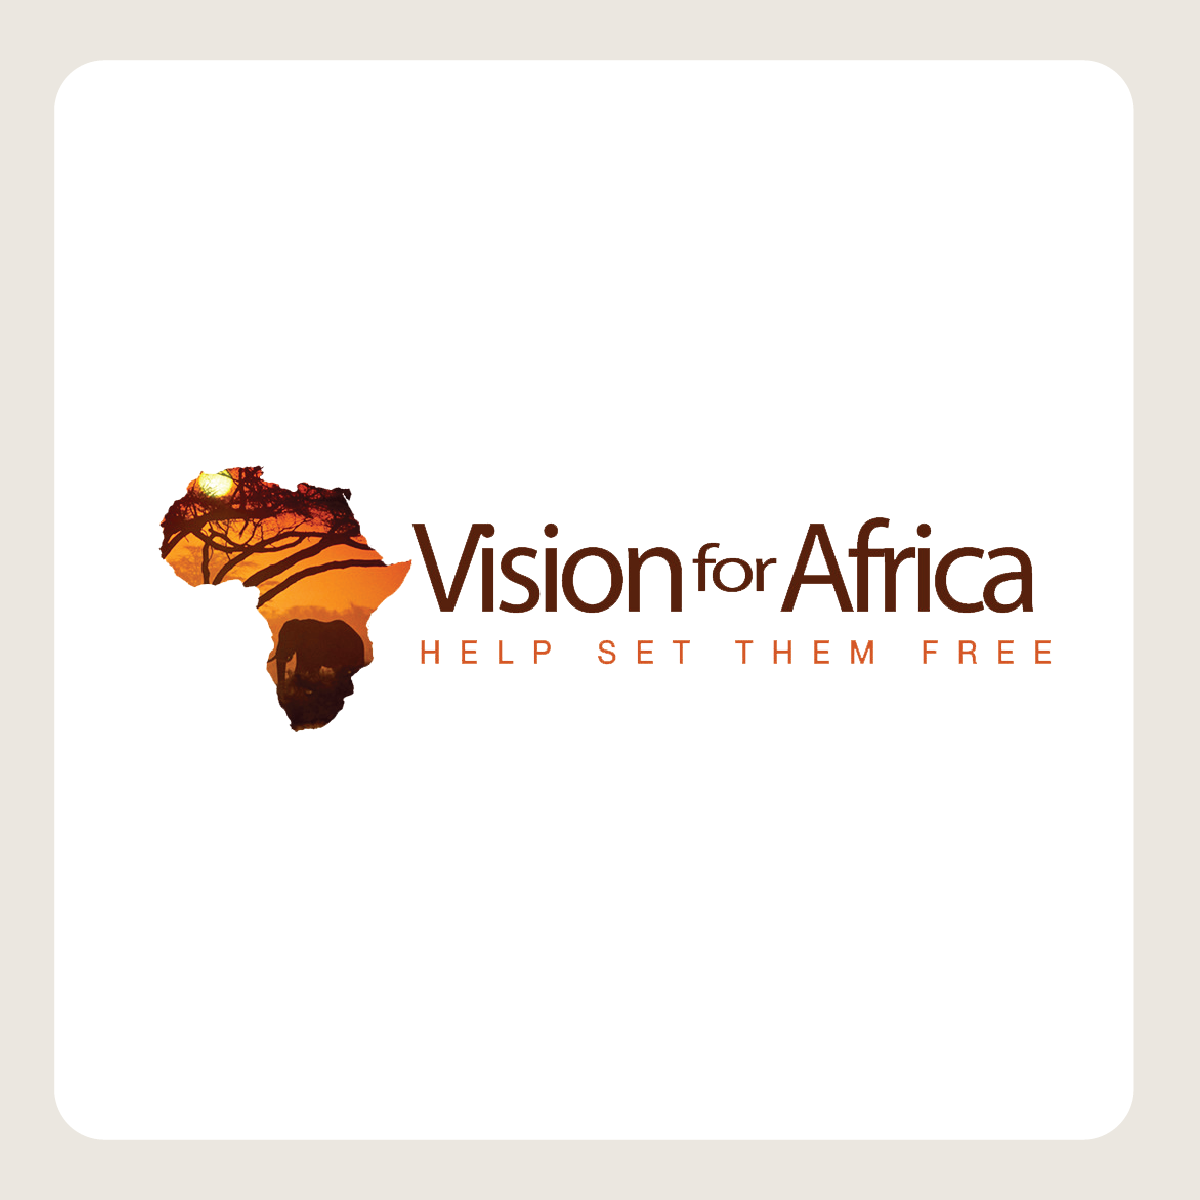 visionforafrica.png